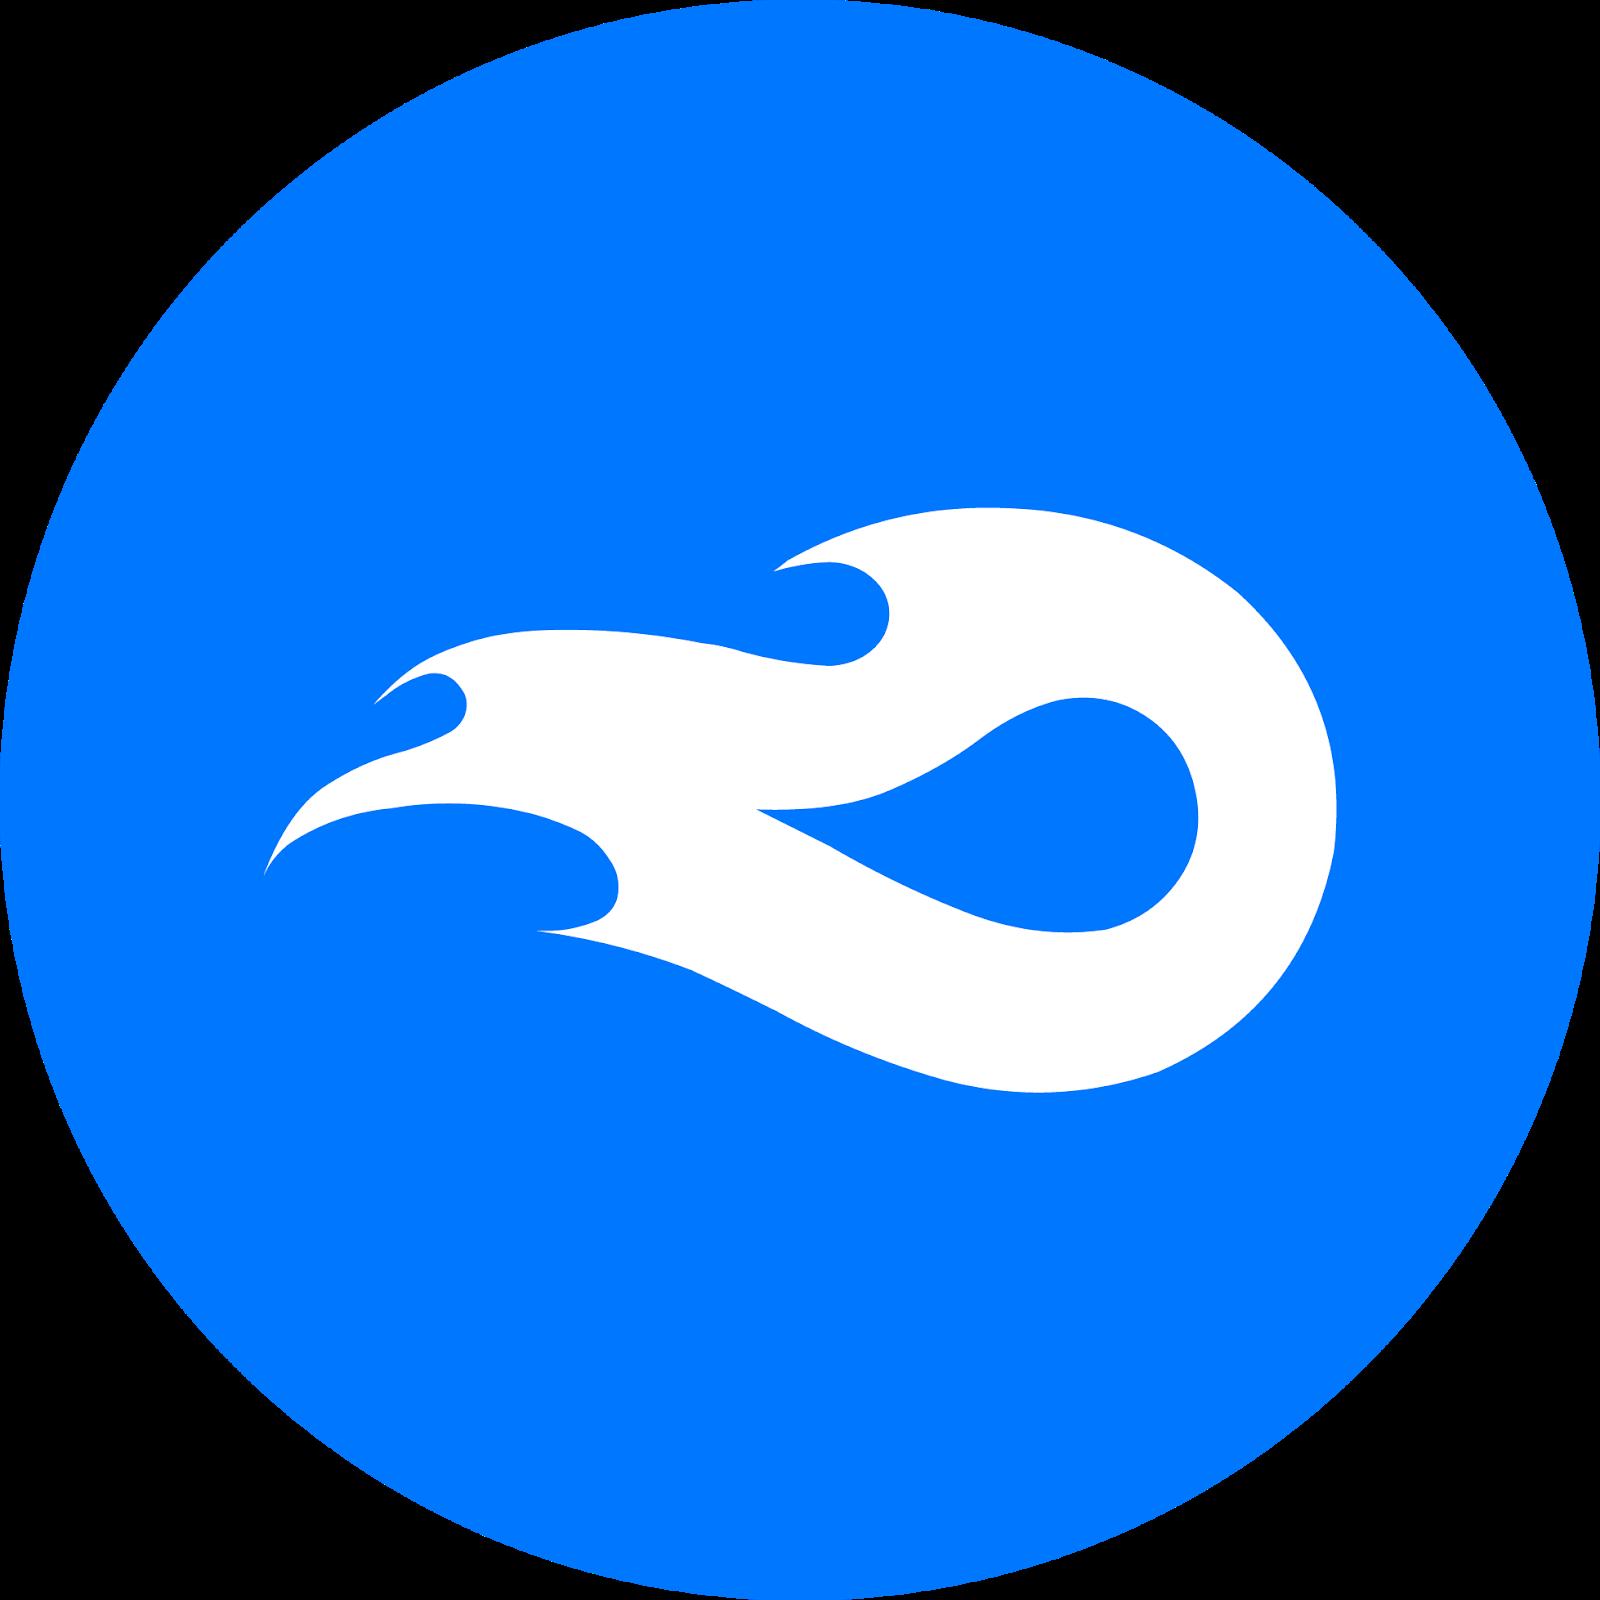 logo mediafire